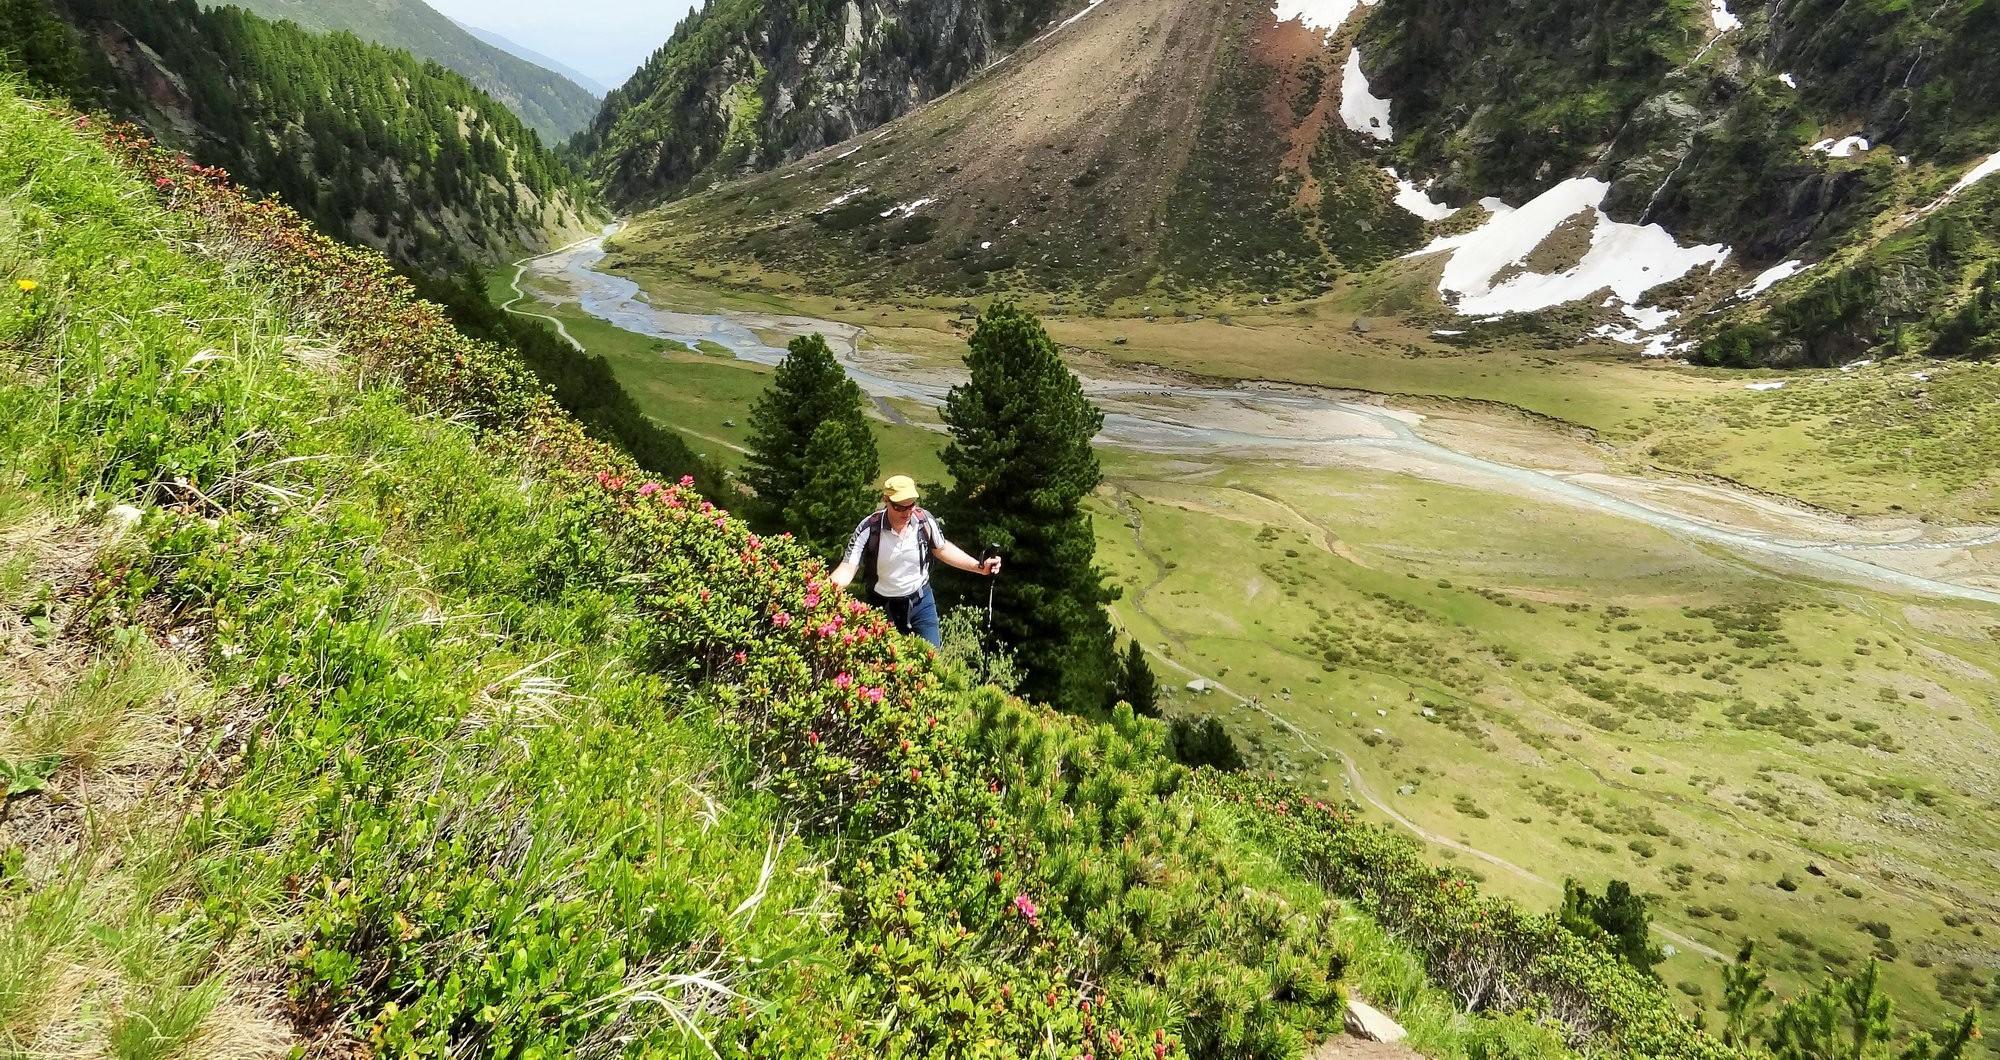 Hicking to the Sulzenau hut